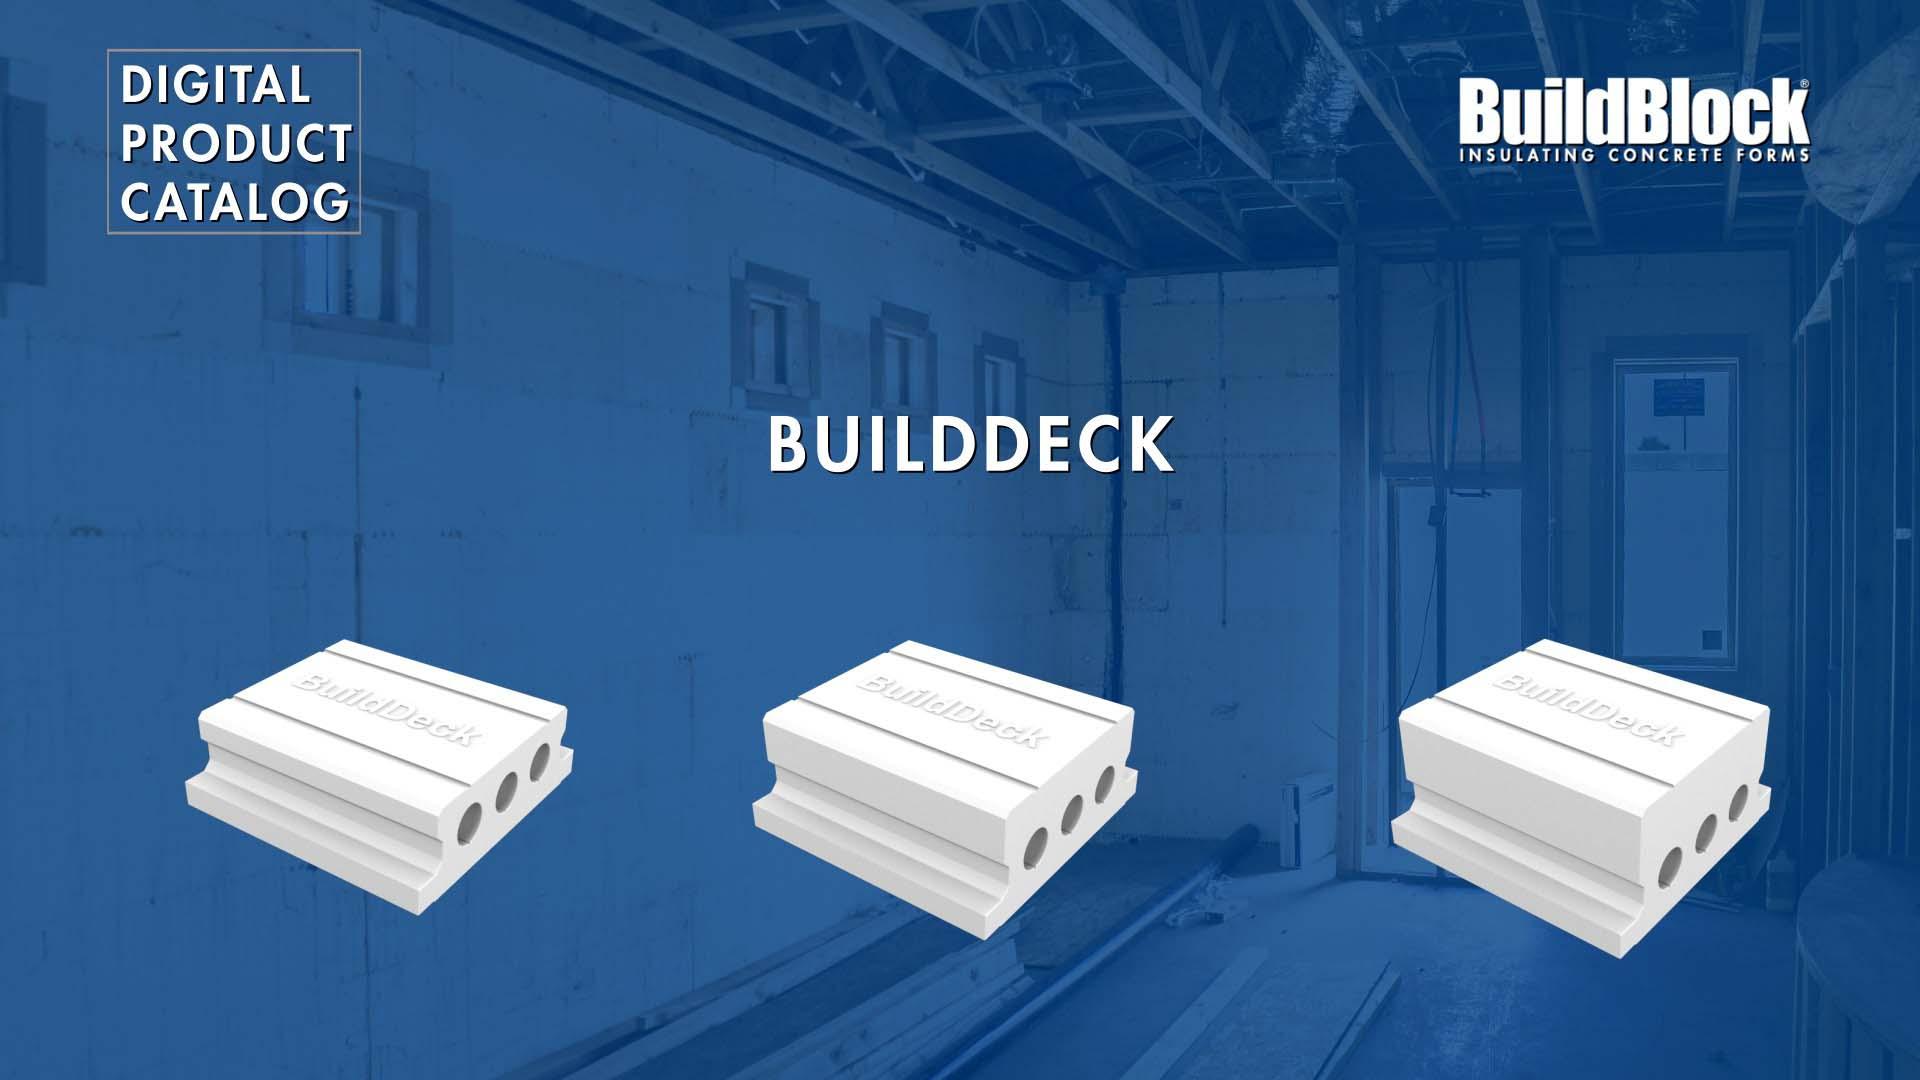 Video: Digital Product Catalog: BuildDeck ICF Decking